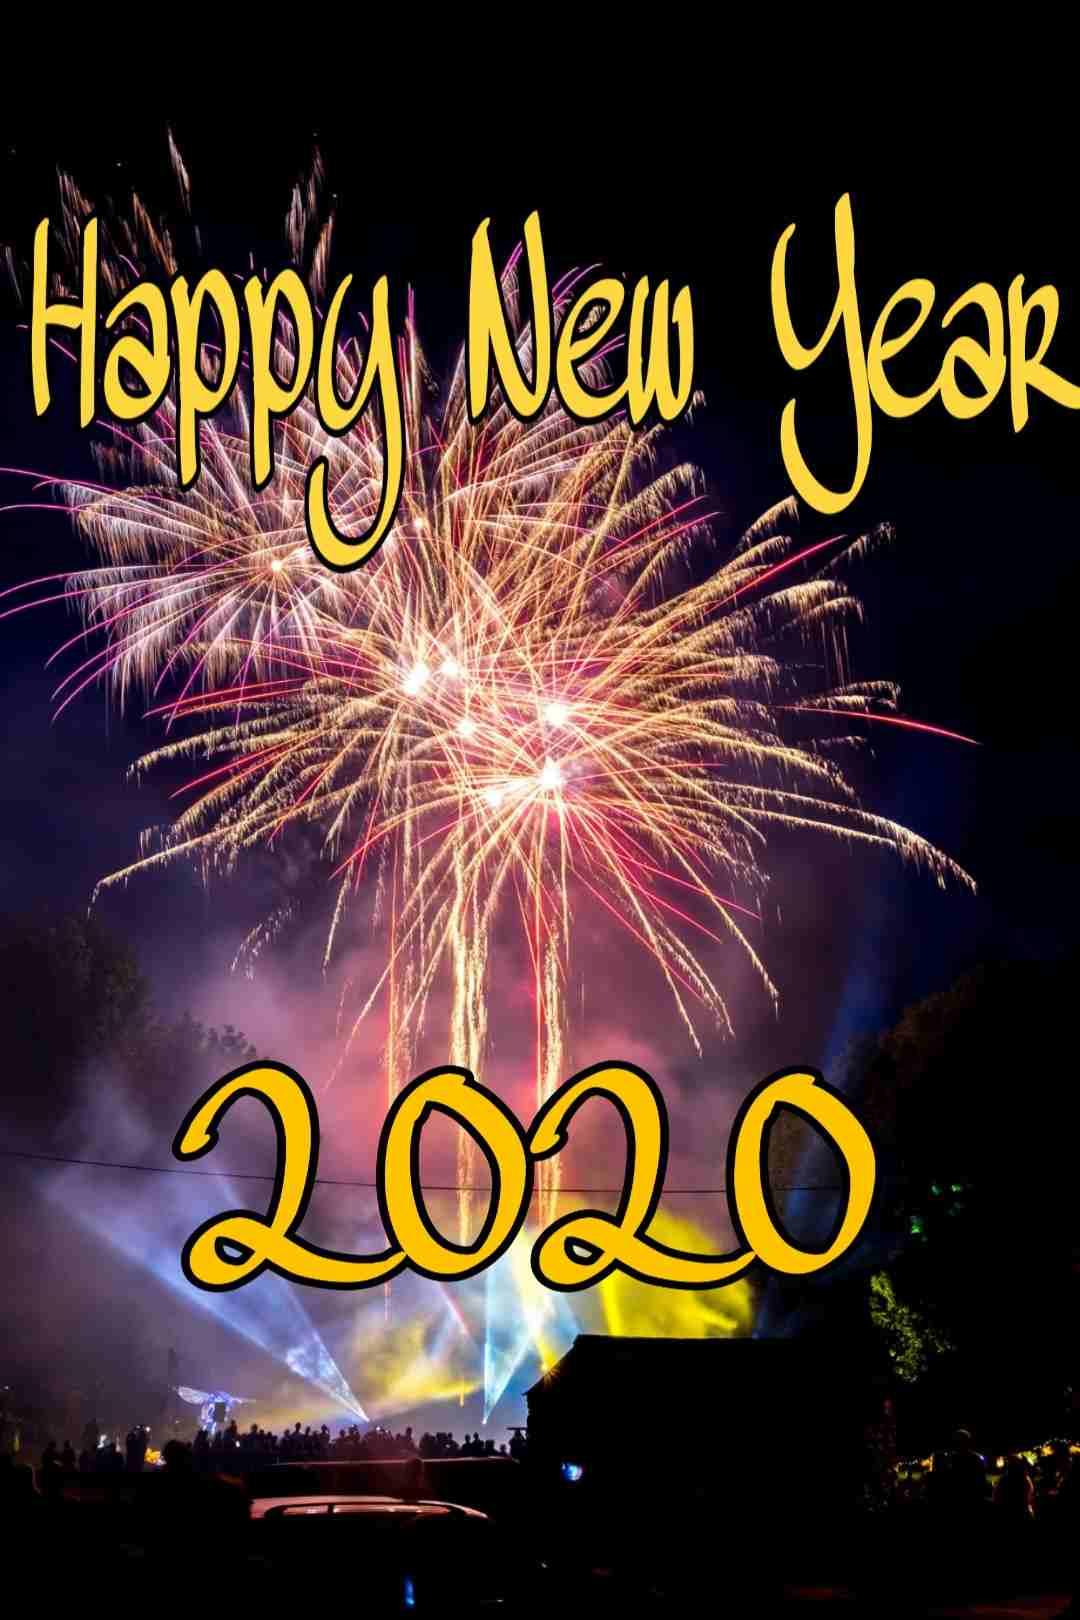 Happy New Year 2020 Facebook Covers Whatsapp Dp Status